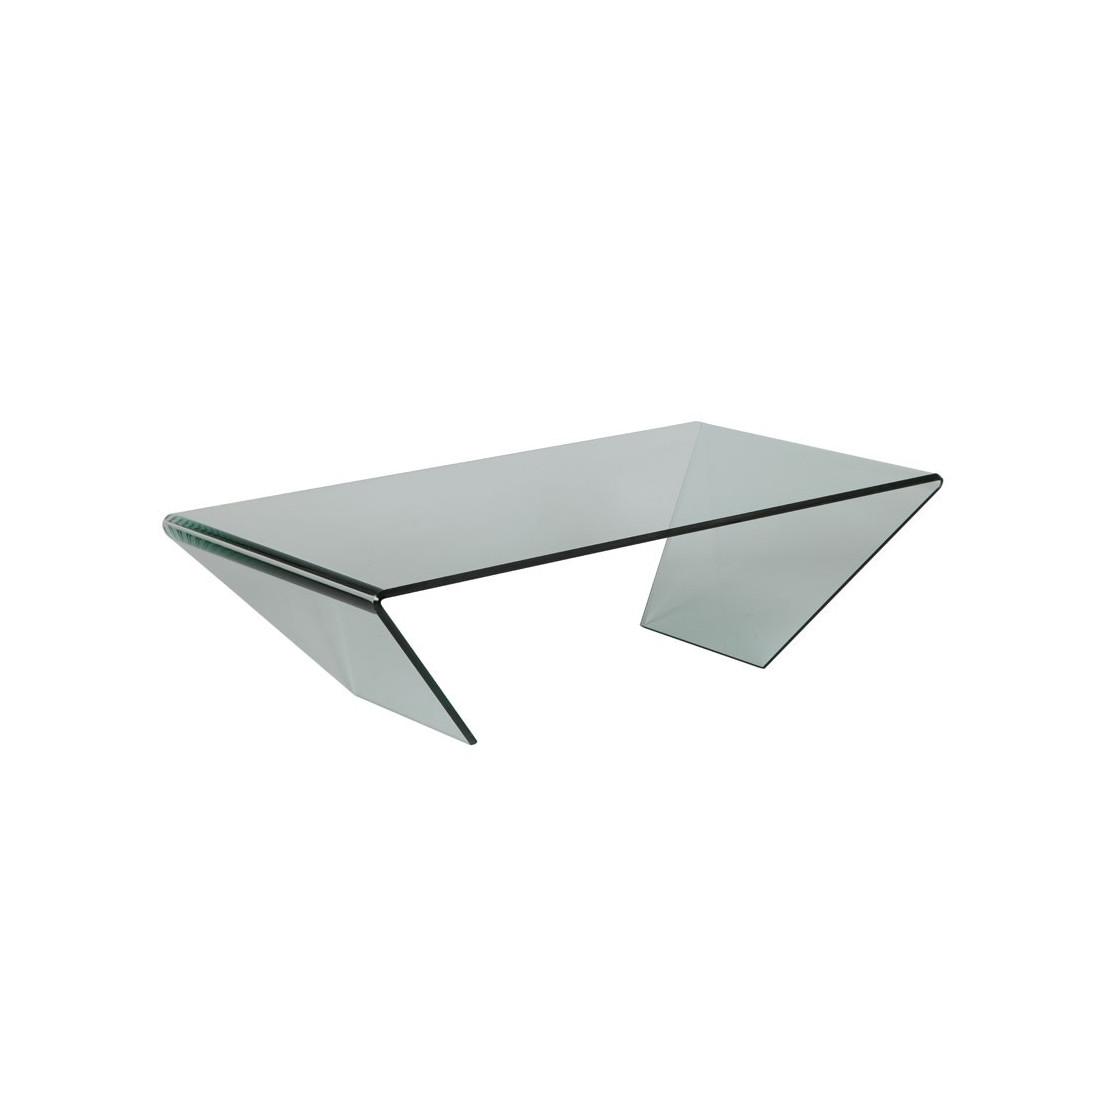 Table Basse Rectangulaire Verre BRIGHT Univers Salon